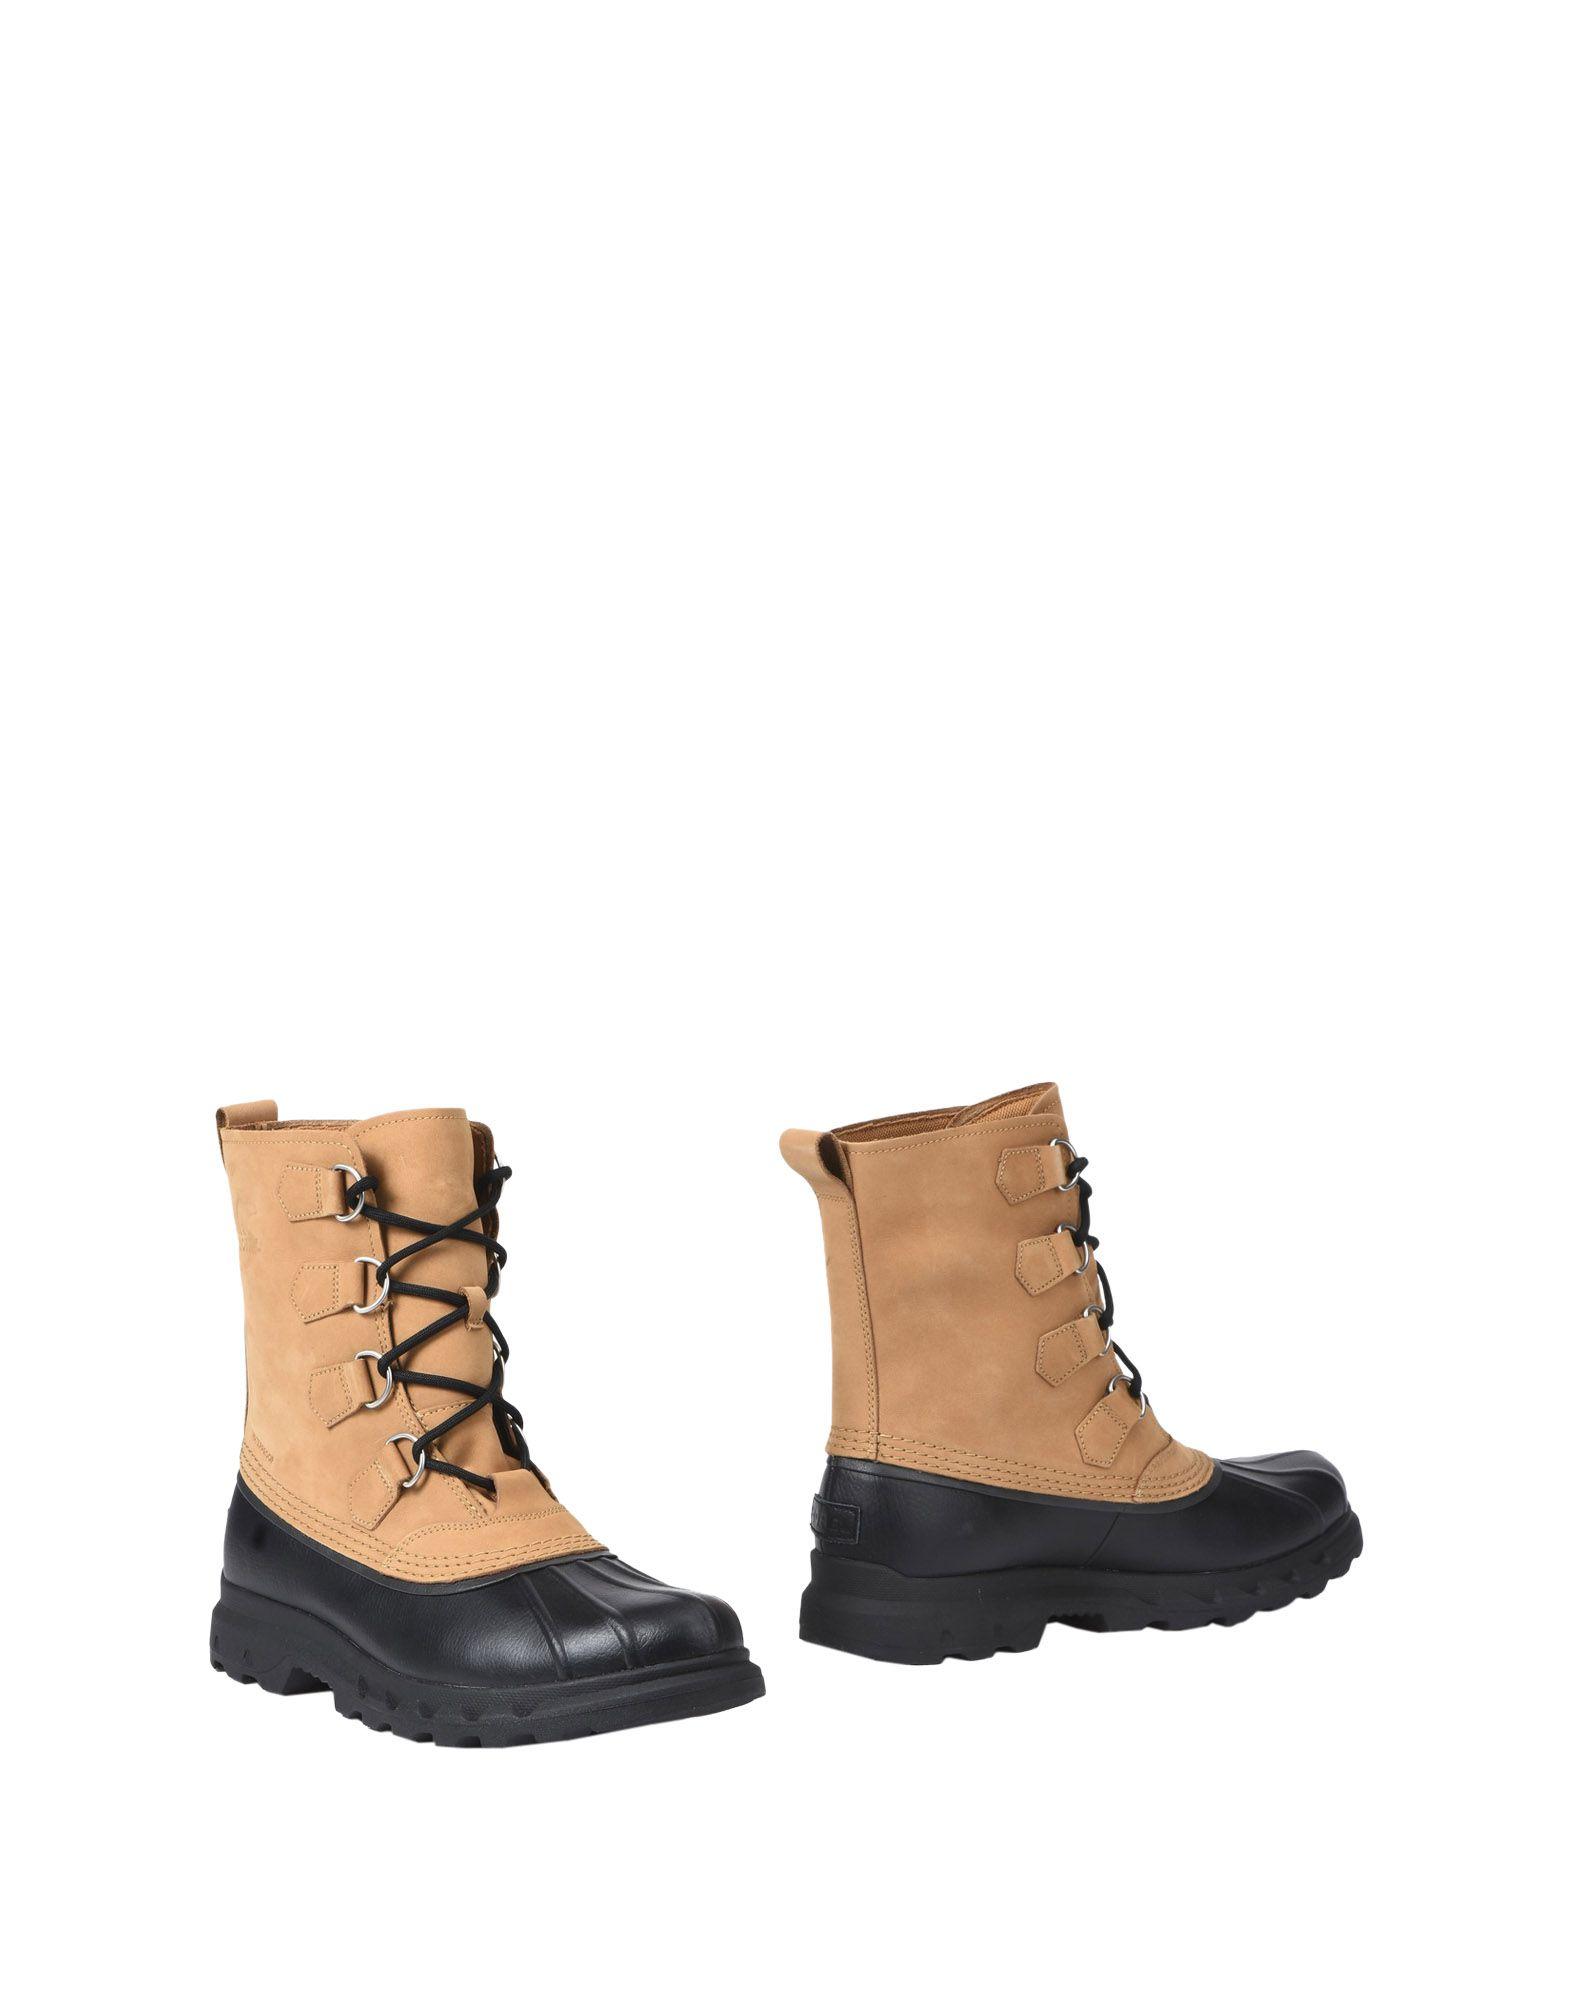 Sorel Portzman Classic  11327691UD Gute Qualität beliebte Schuhe